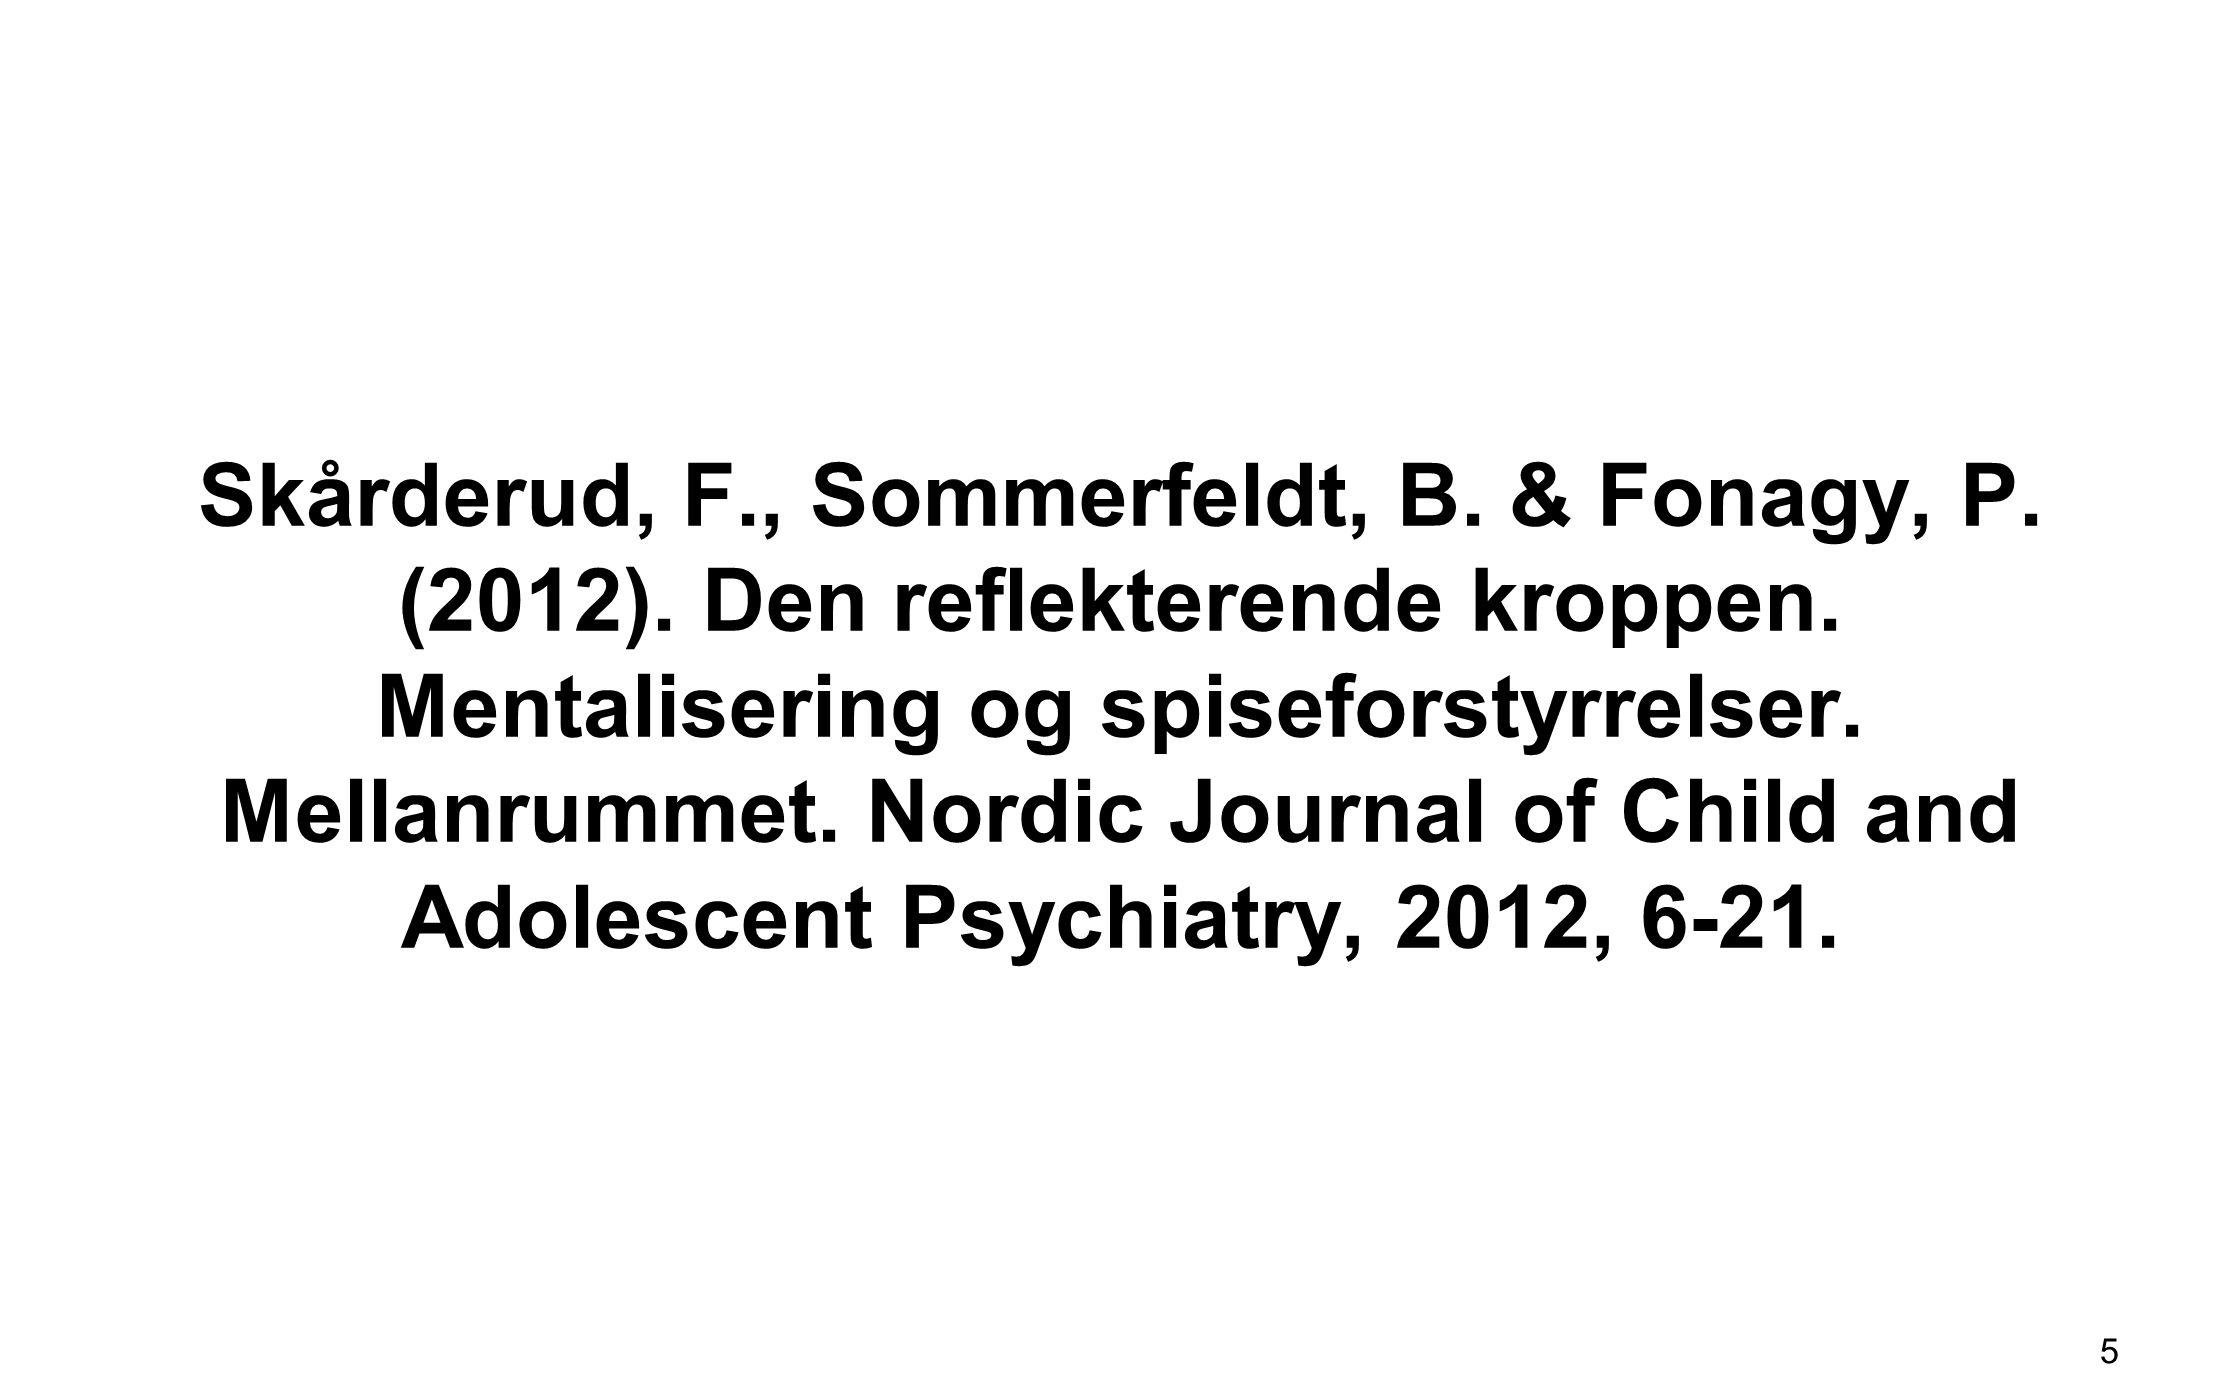 Skårderud, F. , Sommerfeldt, B. & Fonagy, P. (2012)